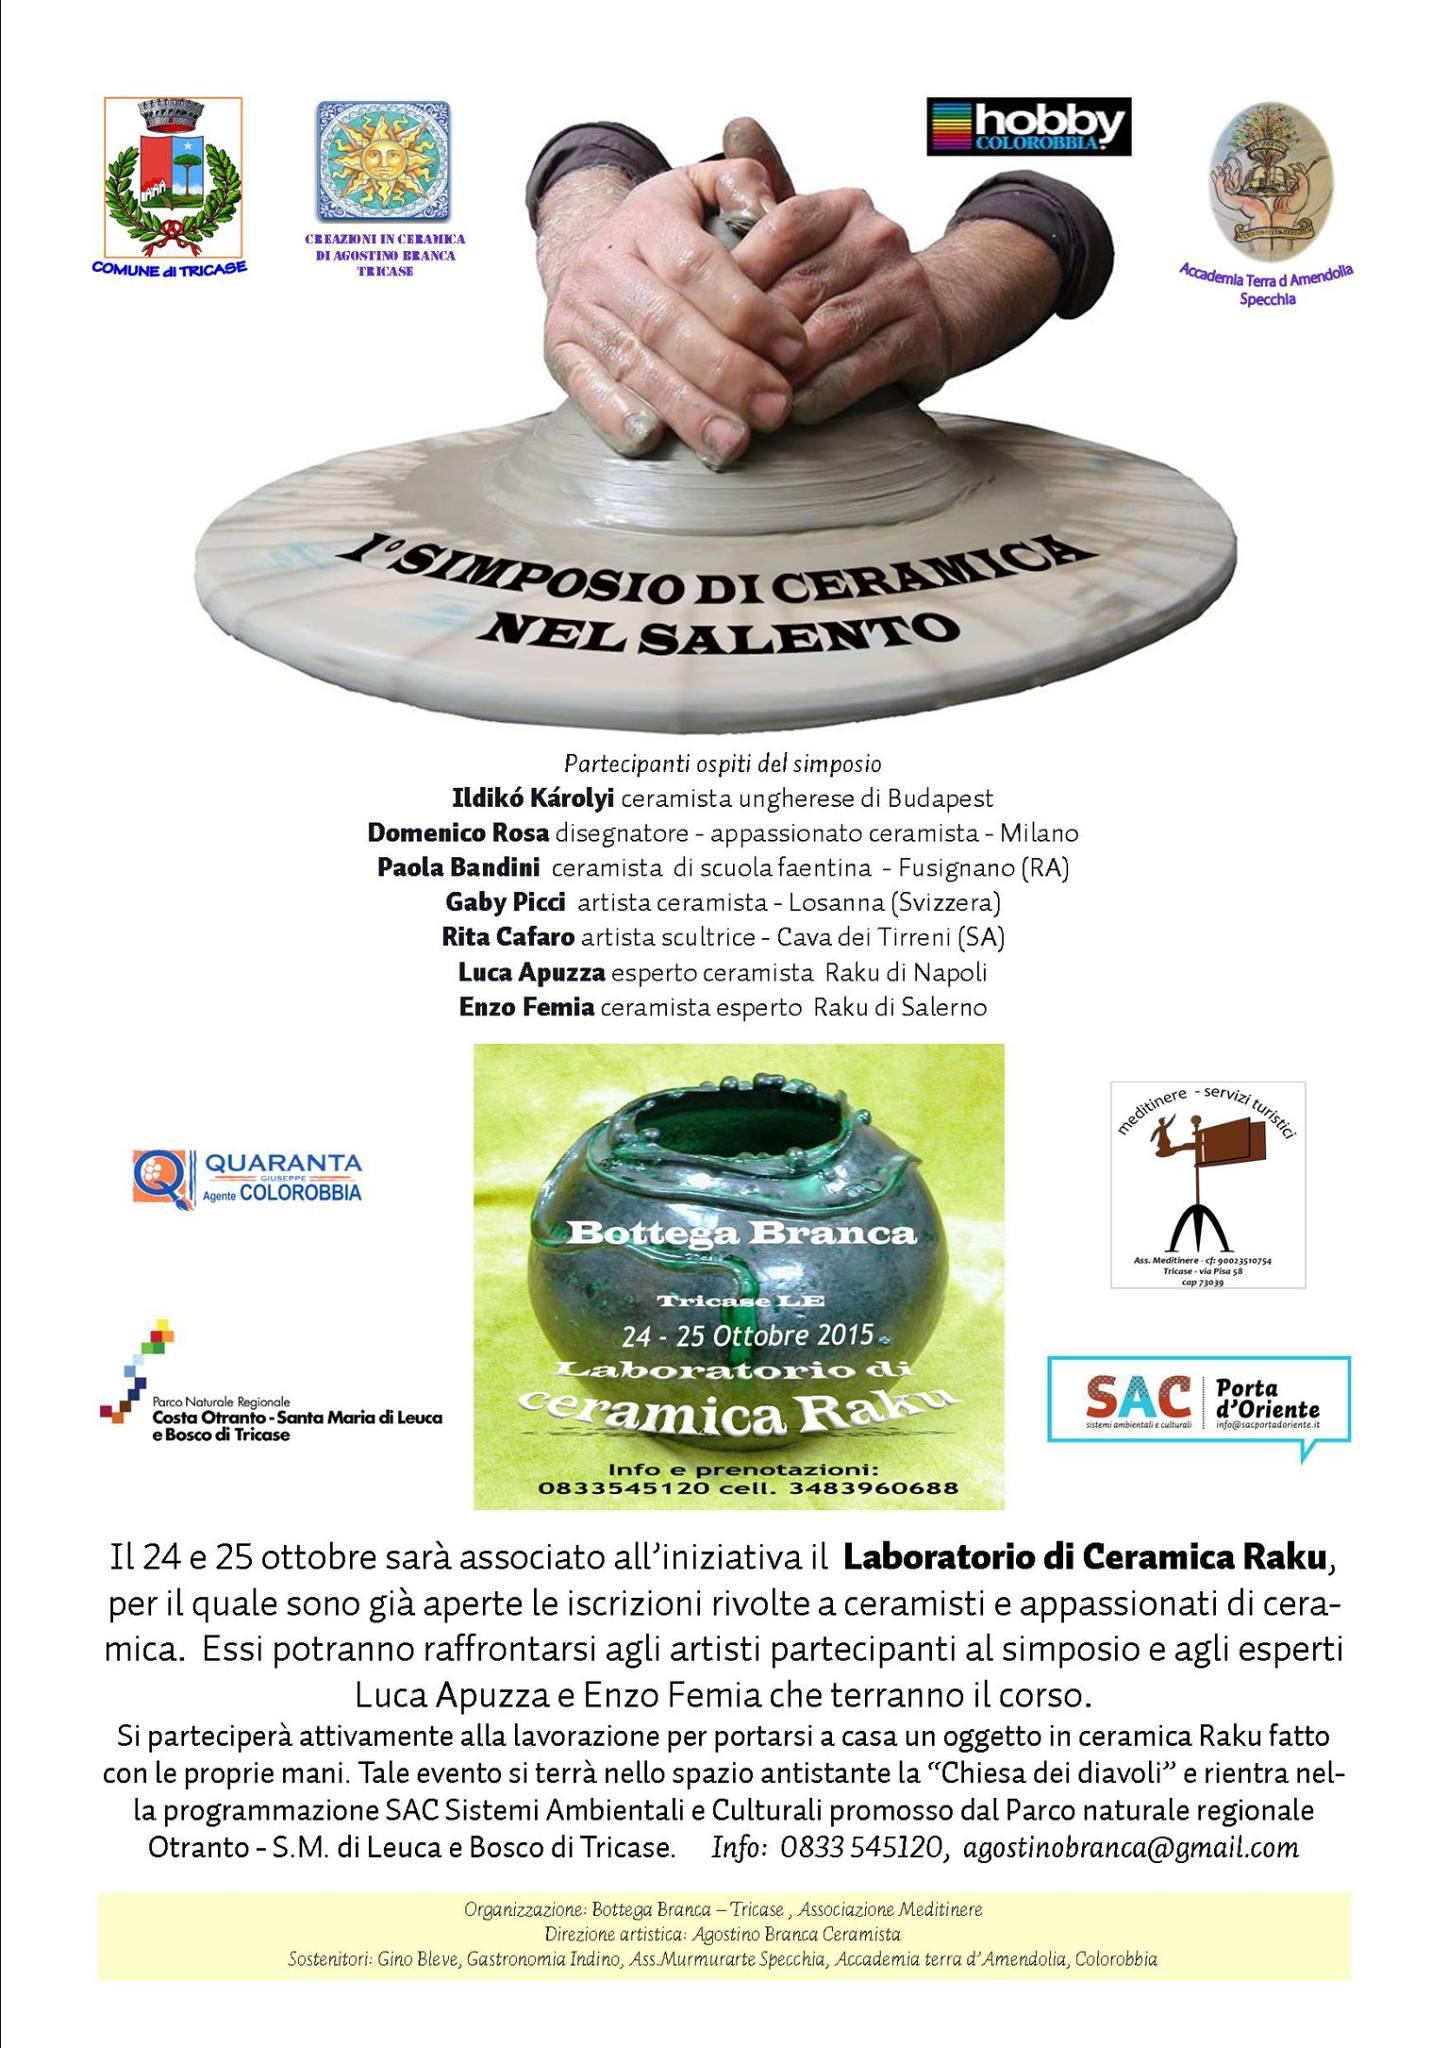 Official Poster - 1st International Ceramic Symposium in Salento and Raku Workshop